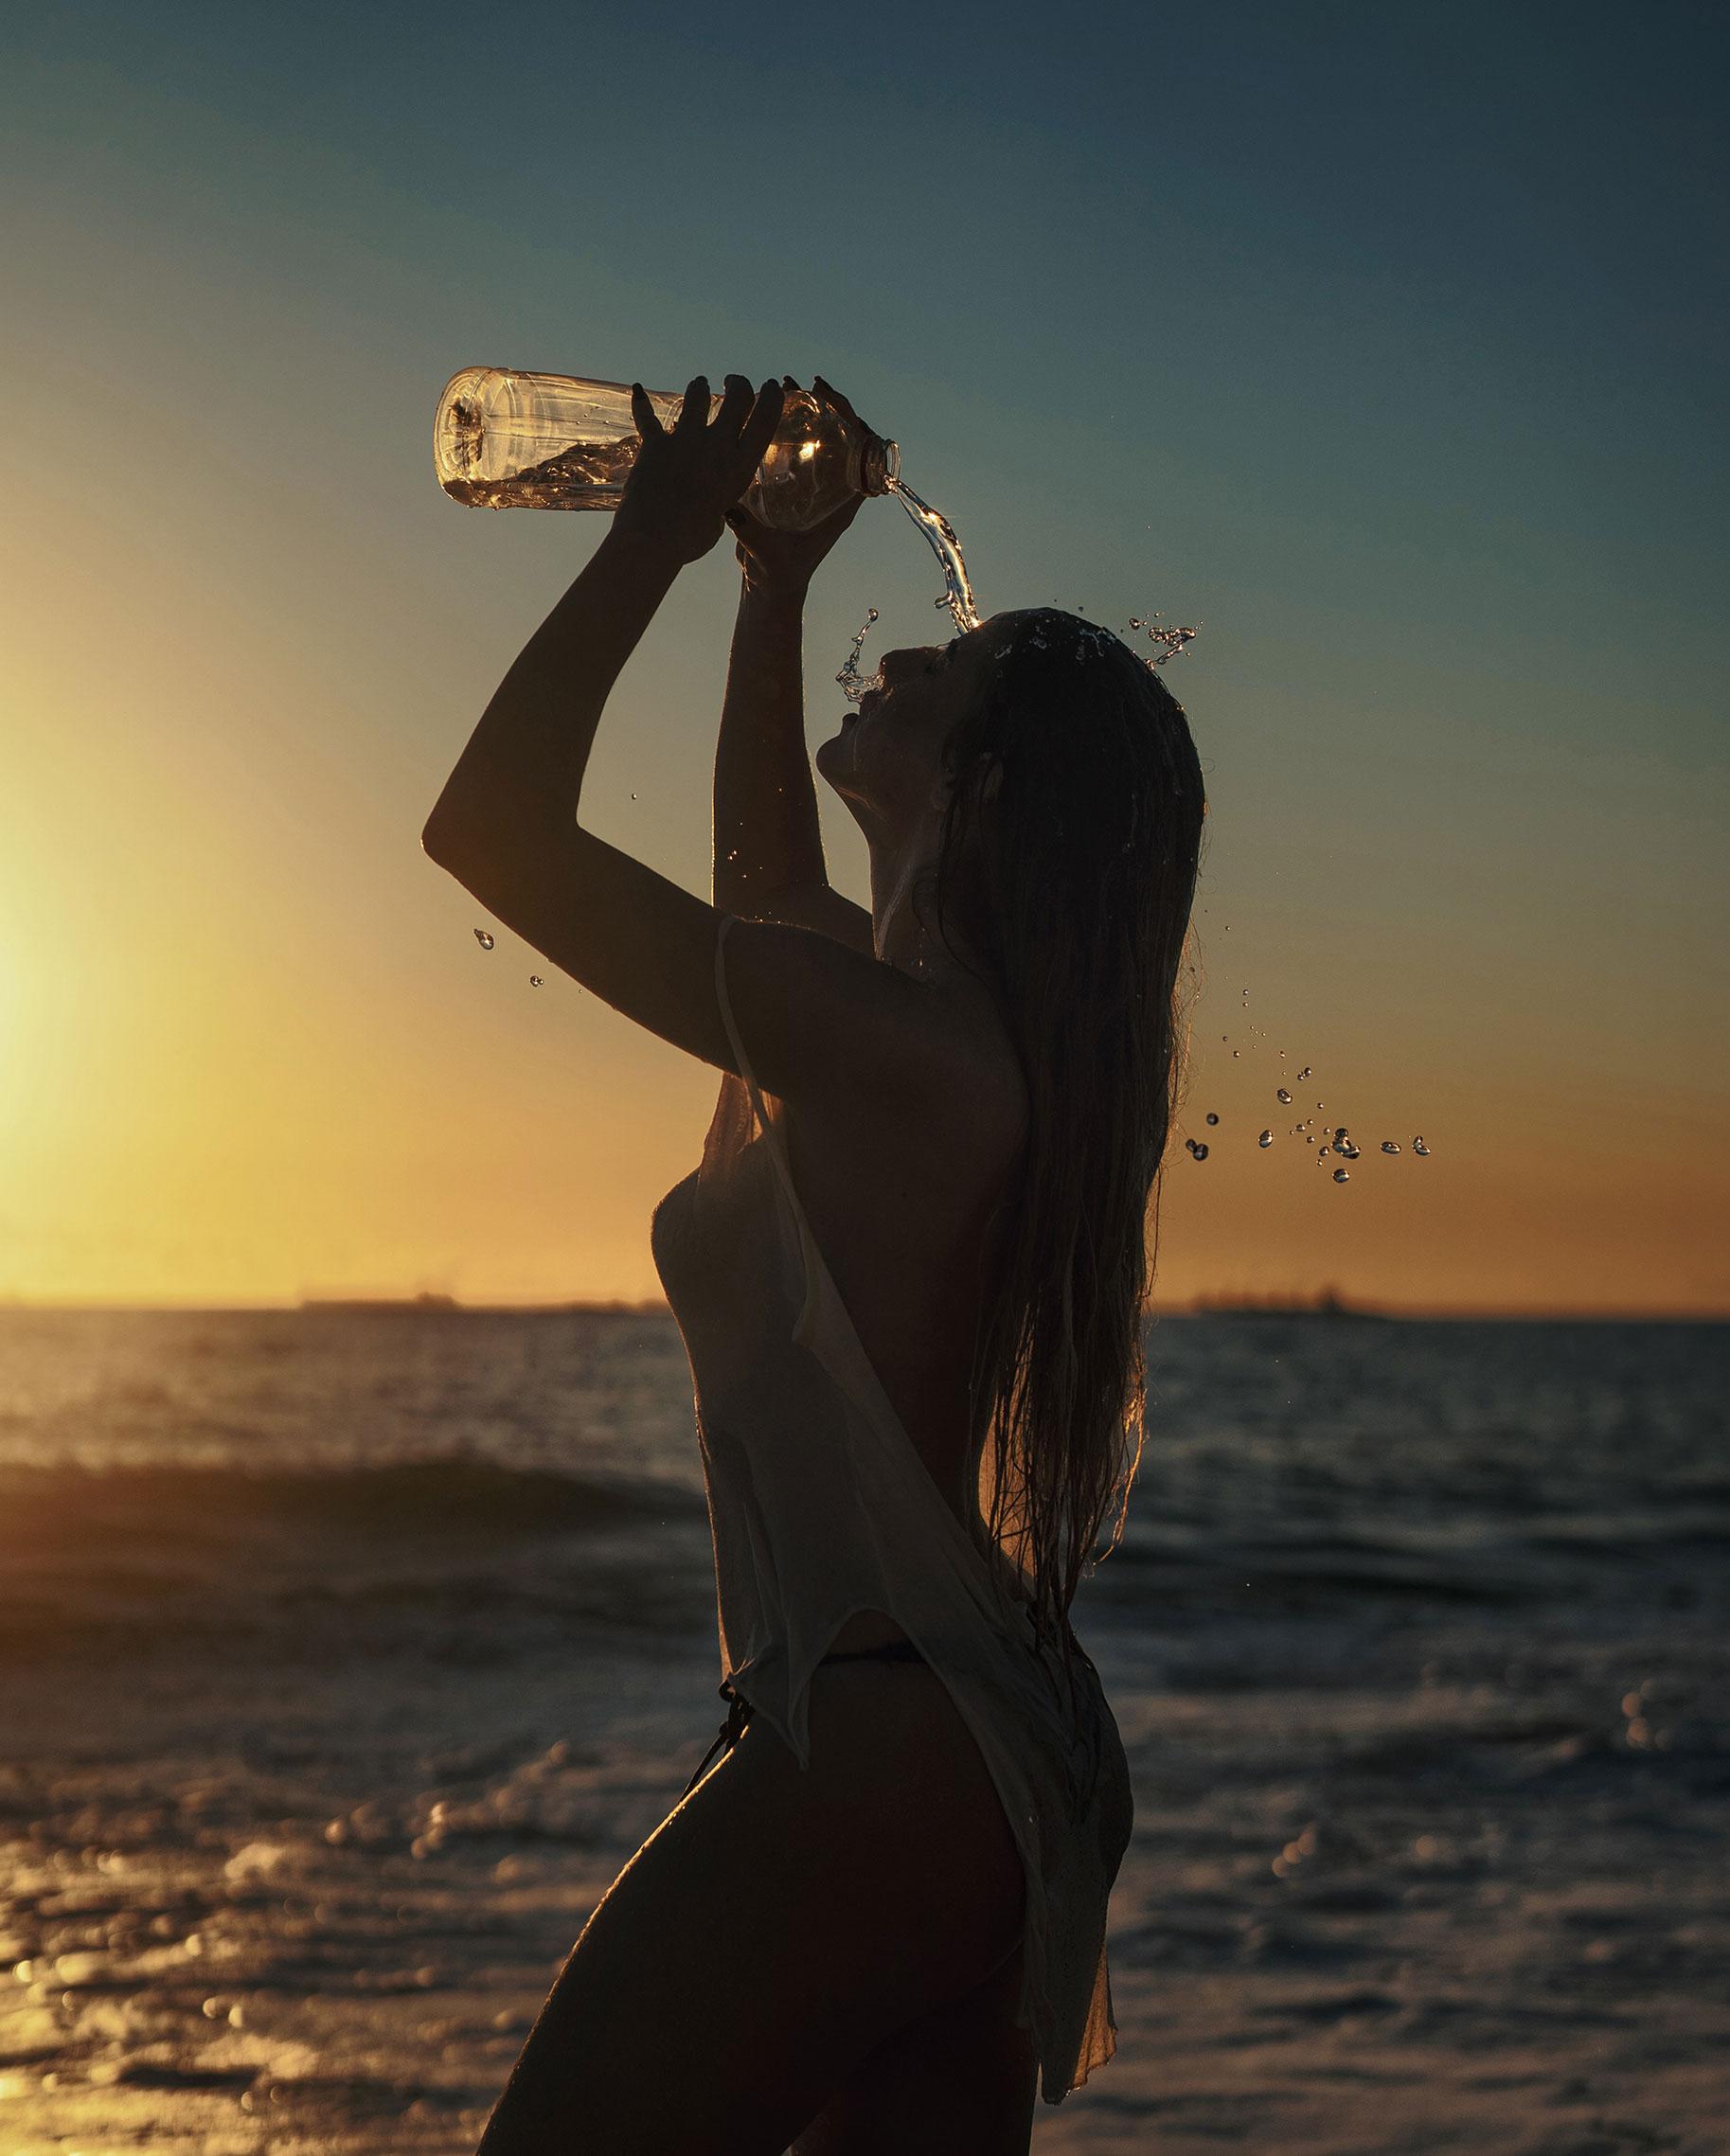 Девушка купается в море на закате / фото 03